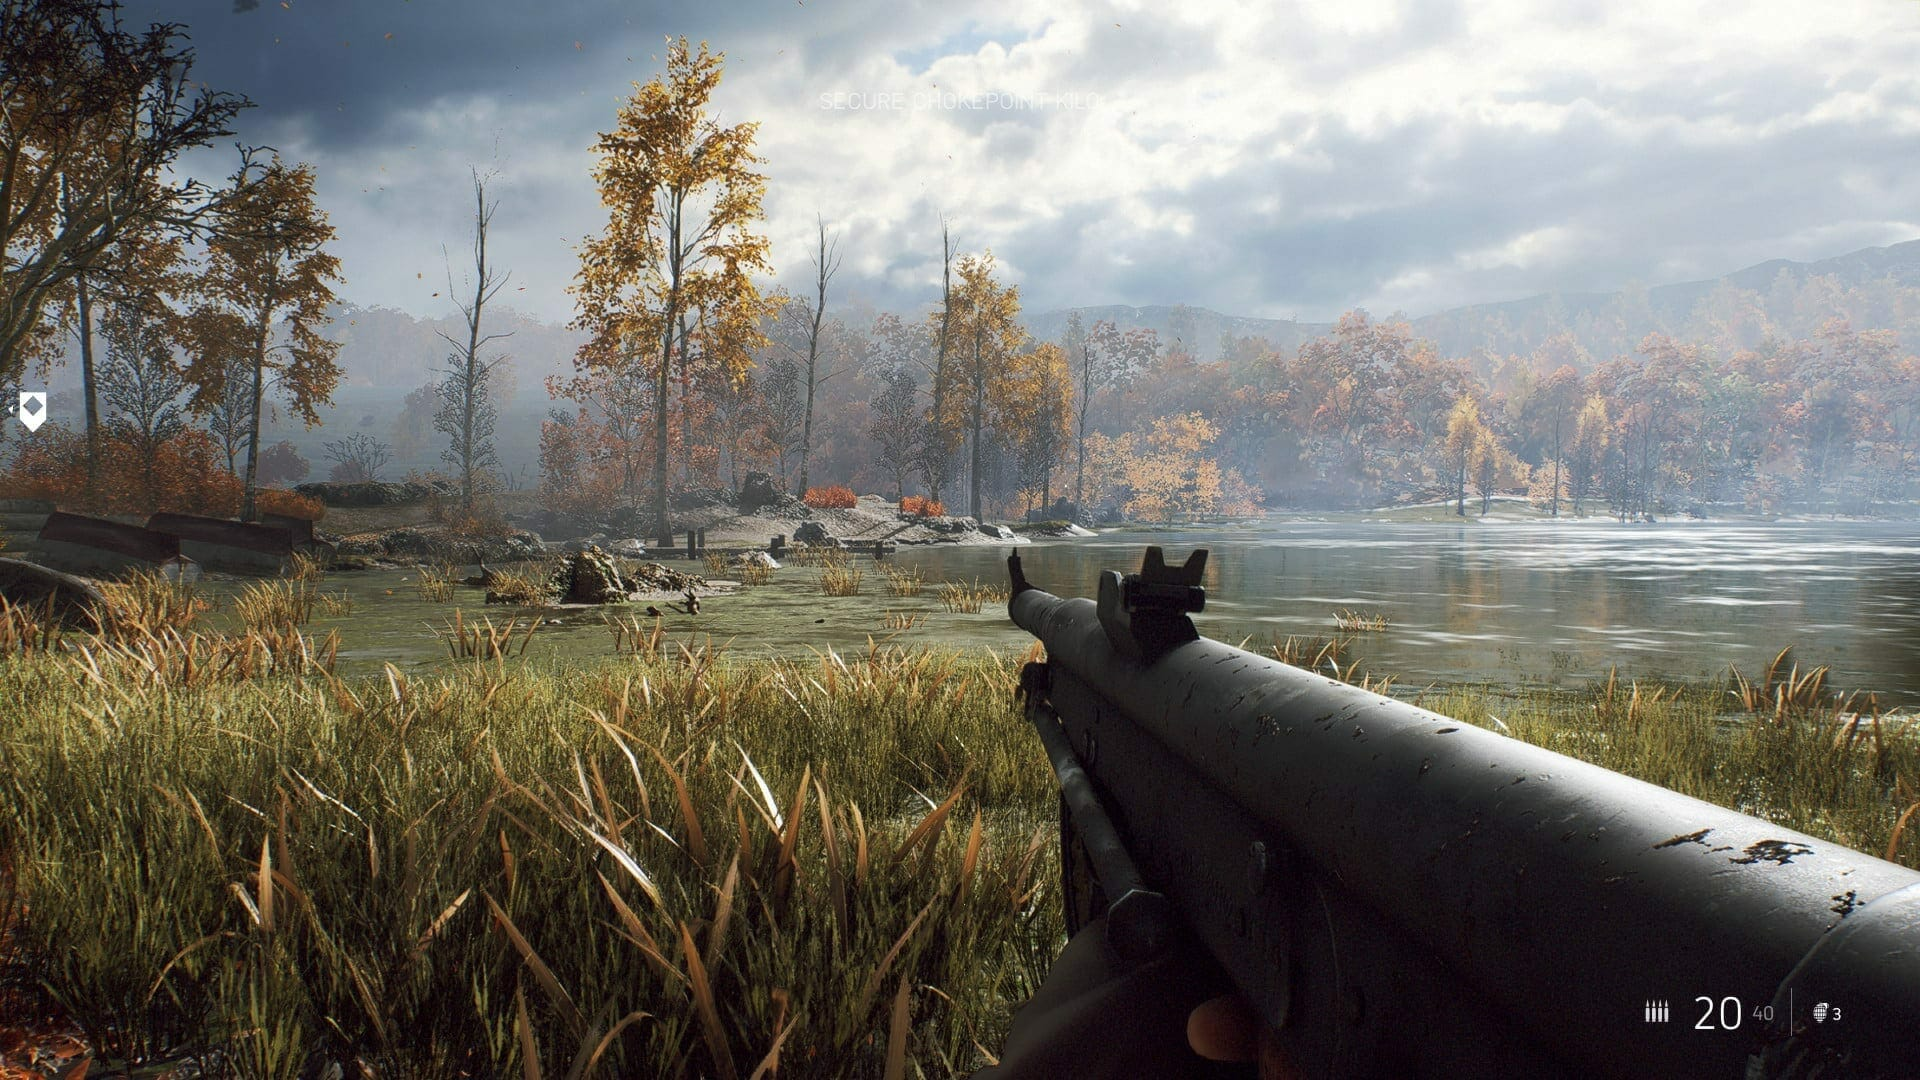 Battlefield 5 update 1.16